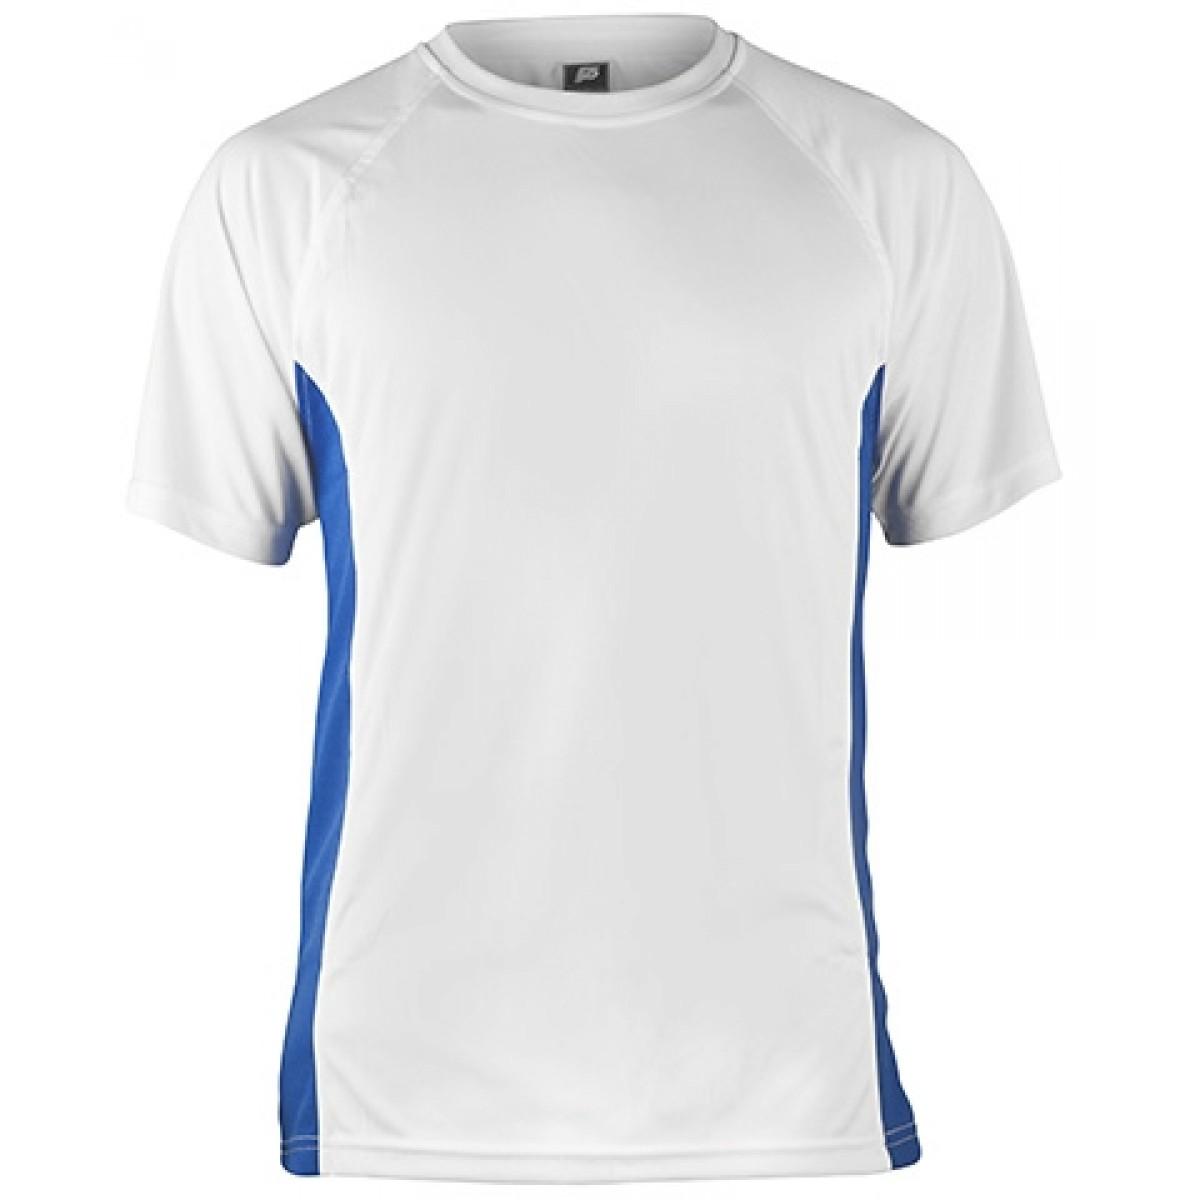 Short Sleeve White Performance With Blue Side Insert-White/Blue-M